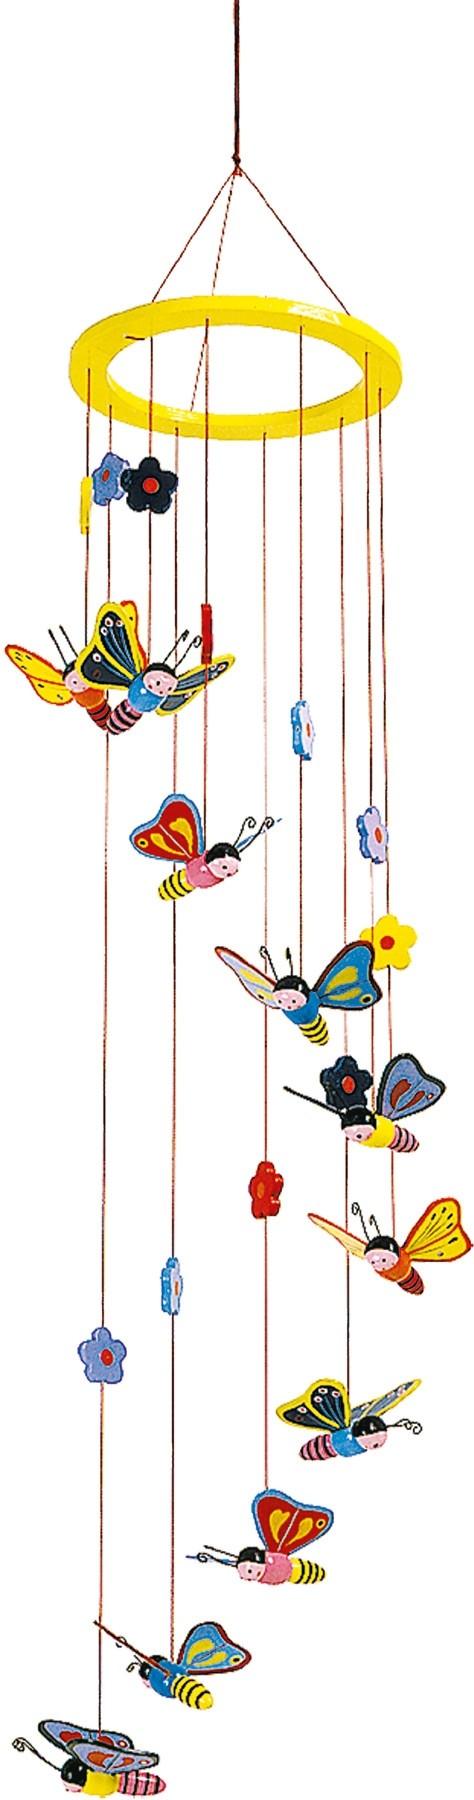 Giostrina farfalle